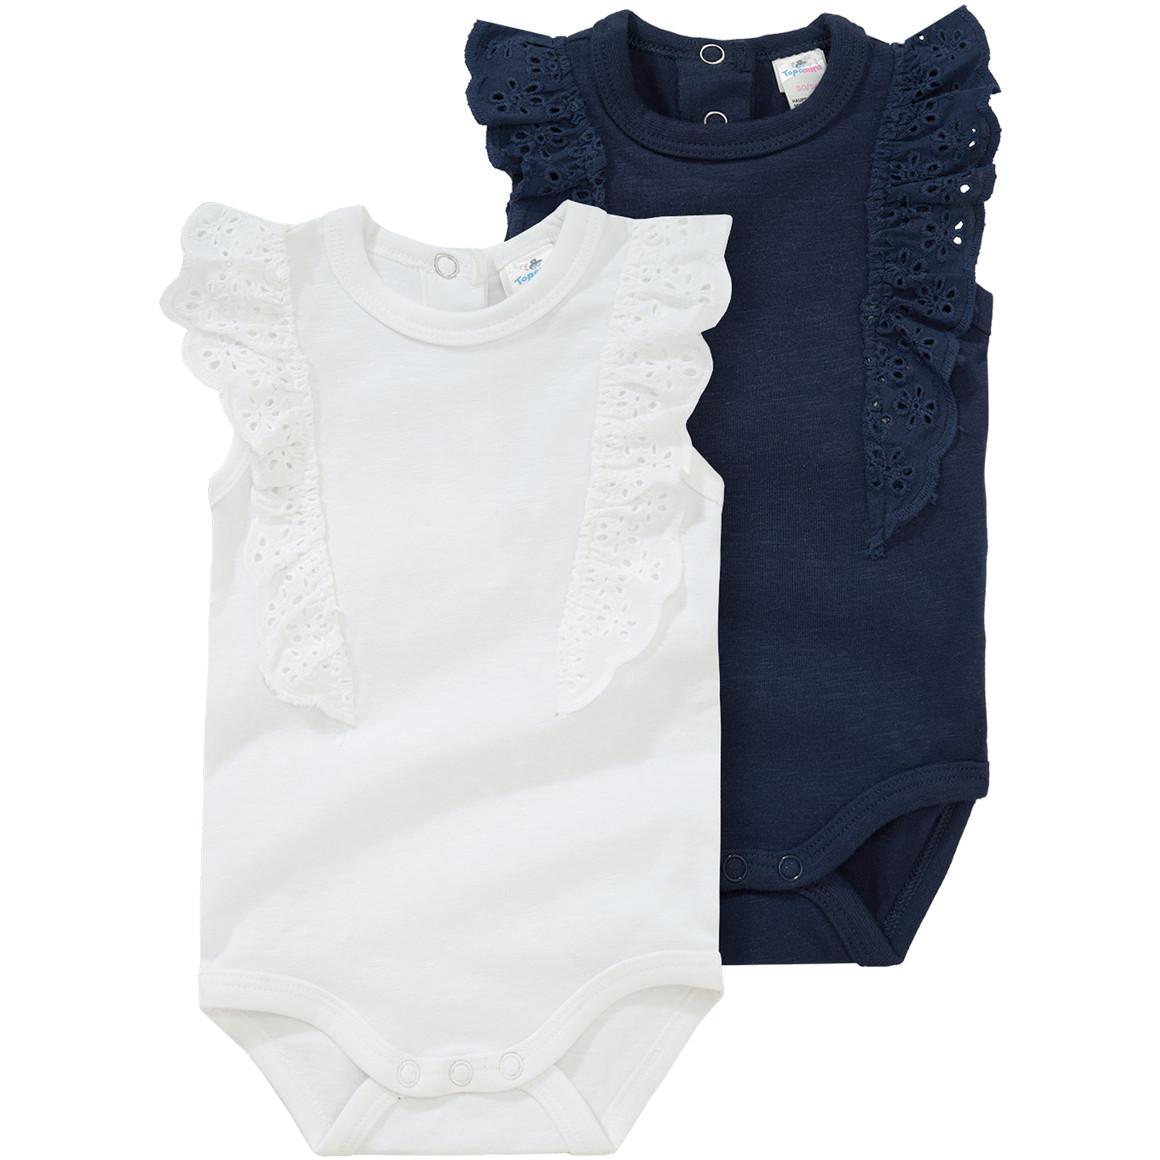 2 Baby Bodys mit Volant